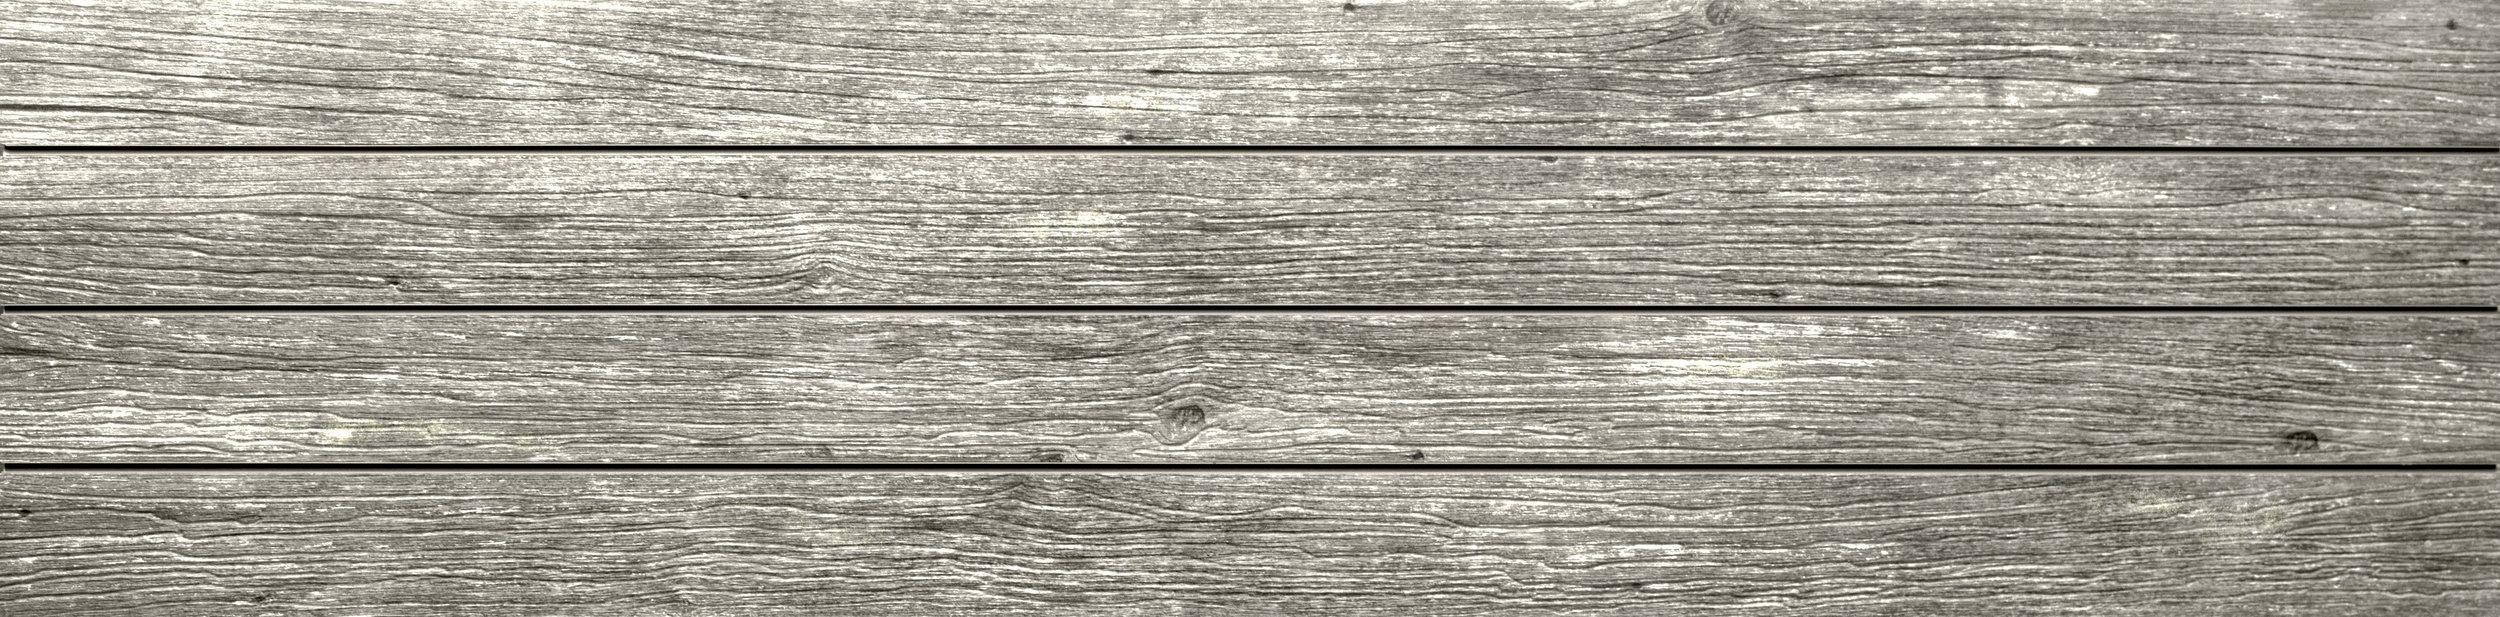 Weathered Wodod sunbaked full sheet.jpg